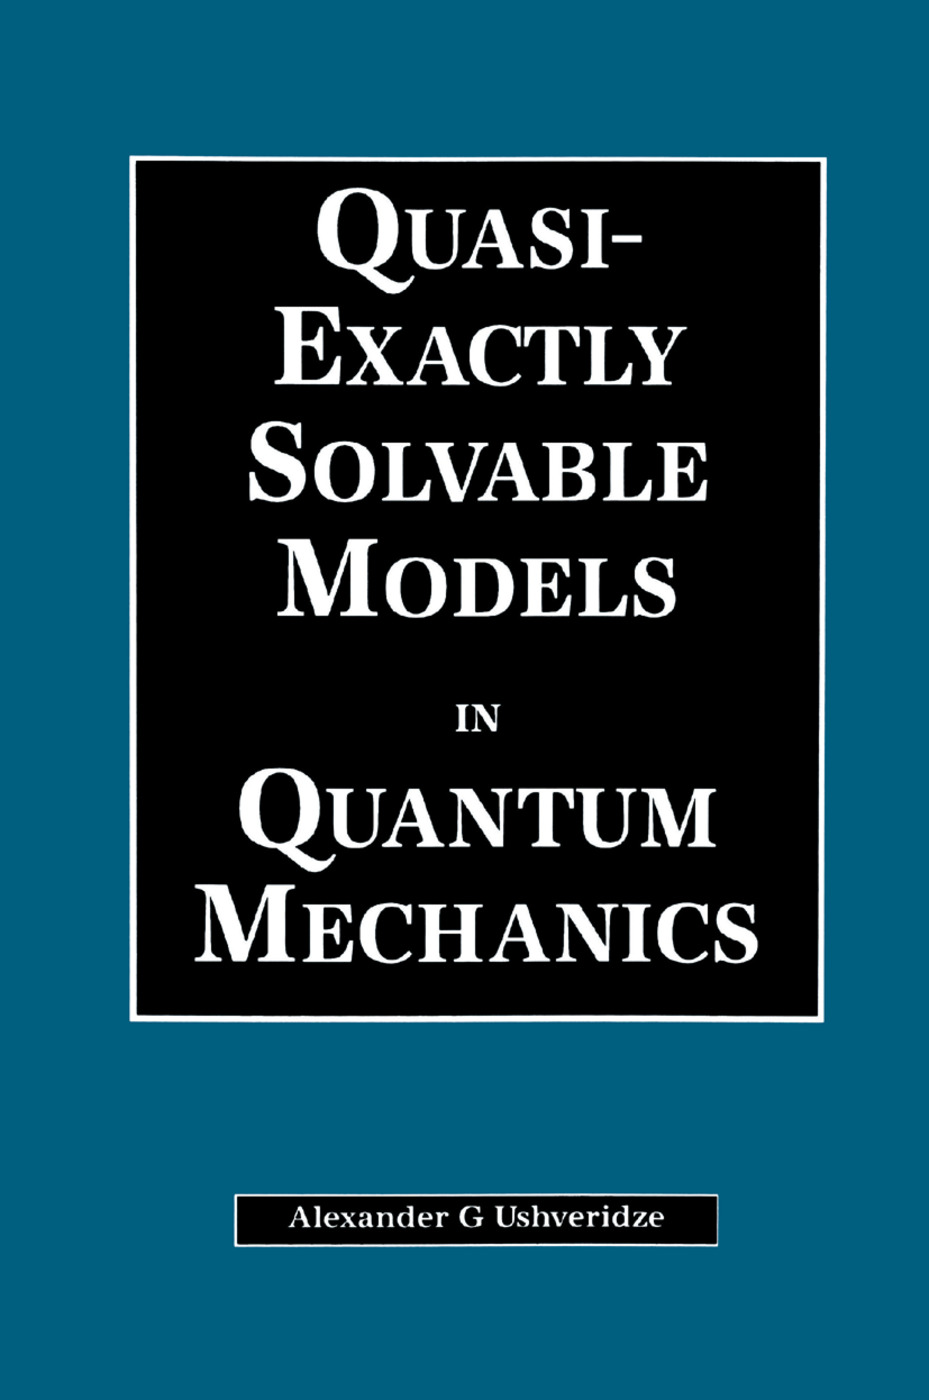 Quasi-Exactly Solvable Models in Quantum Mechanics: 1st Edition (Paperback) book cover